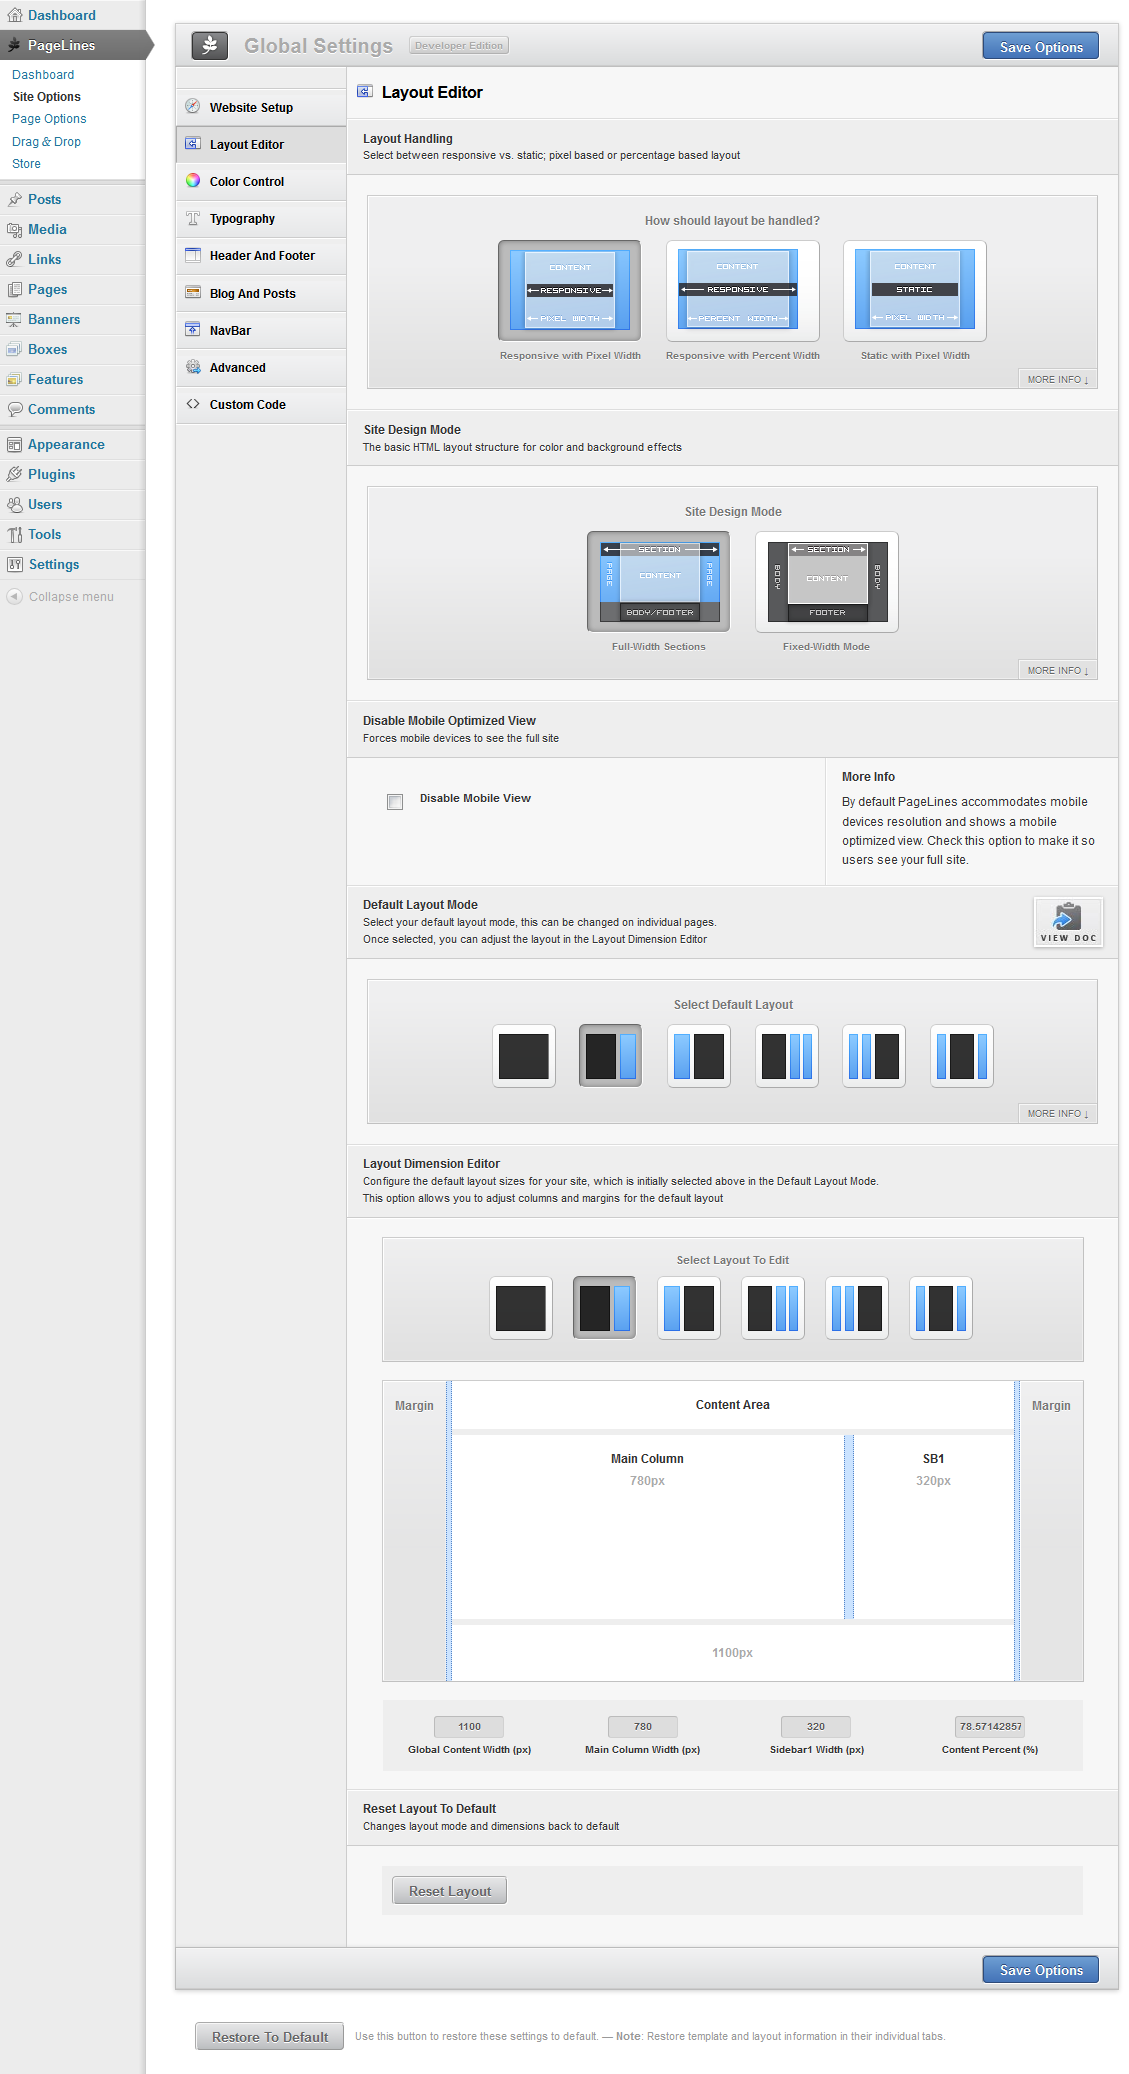 nextgen template editor - pagelines drag drop framework review a first look